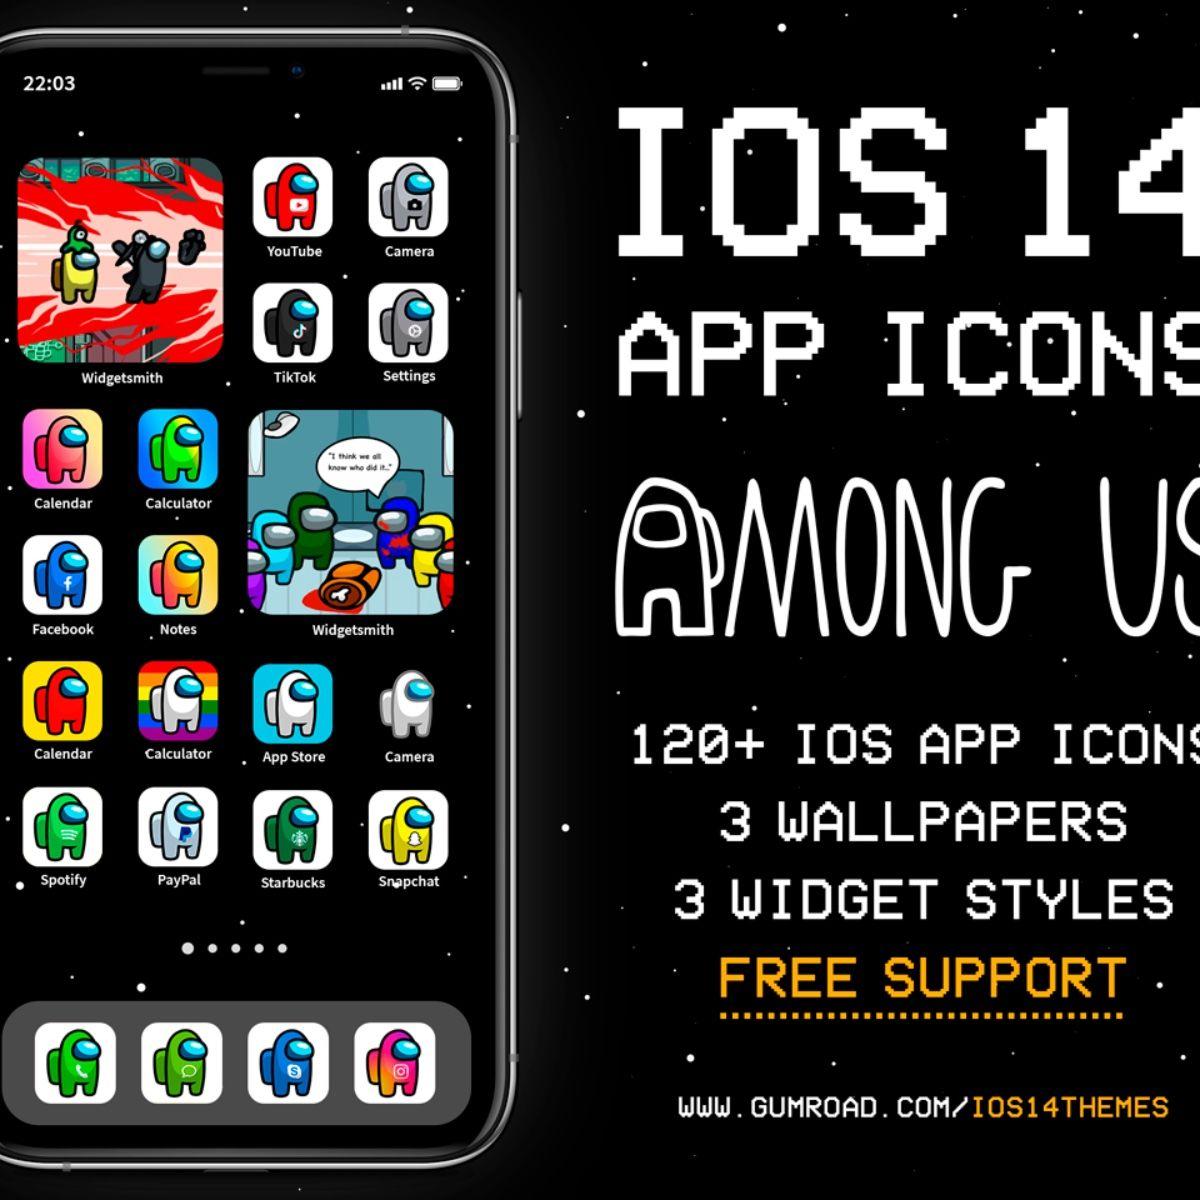 Among Us Ios 14 App Icons Ios14 Among Us Aesthetic Home Screen Iphone Icons Among Us Iphone Theme App Icon Themes App Iphone Icon